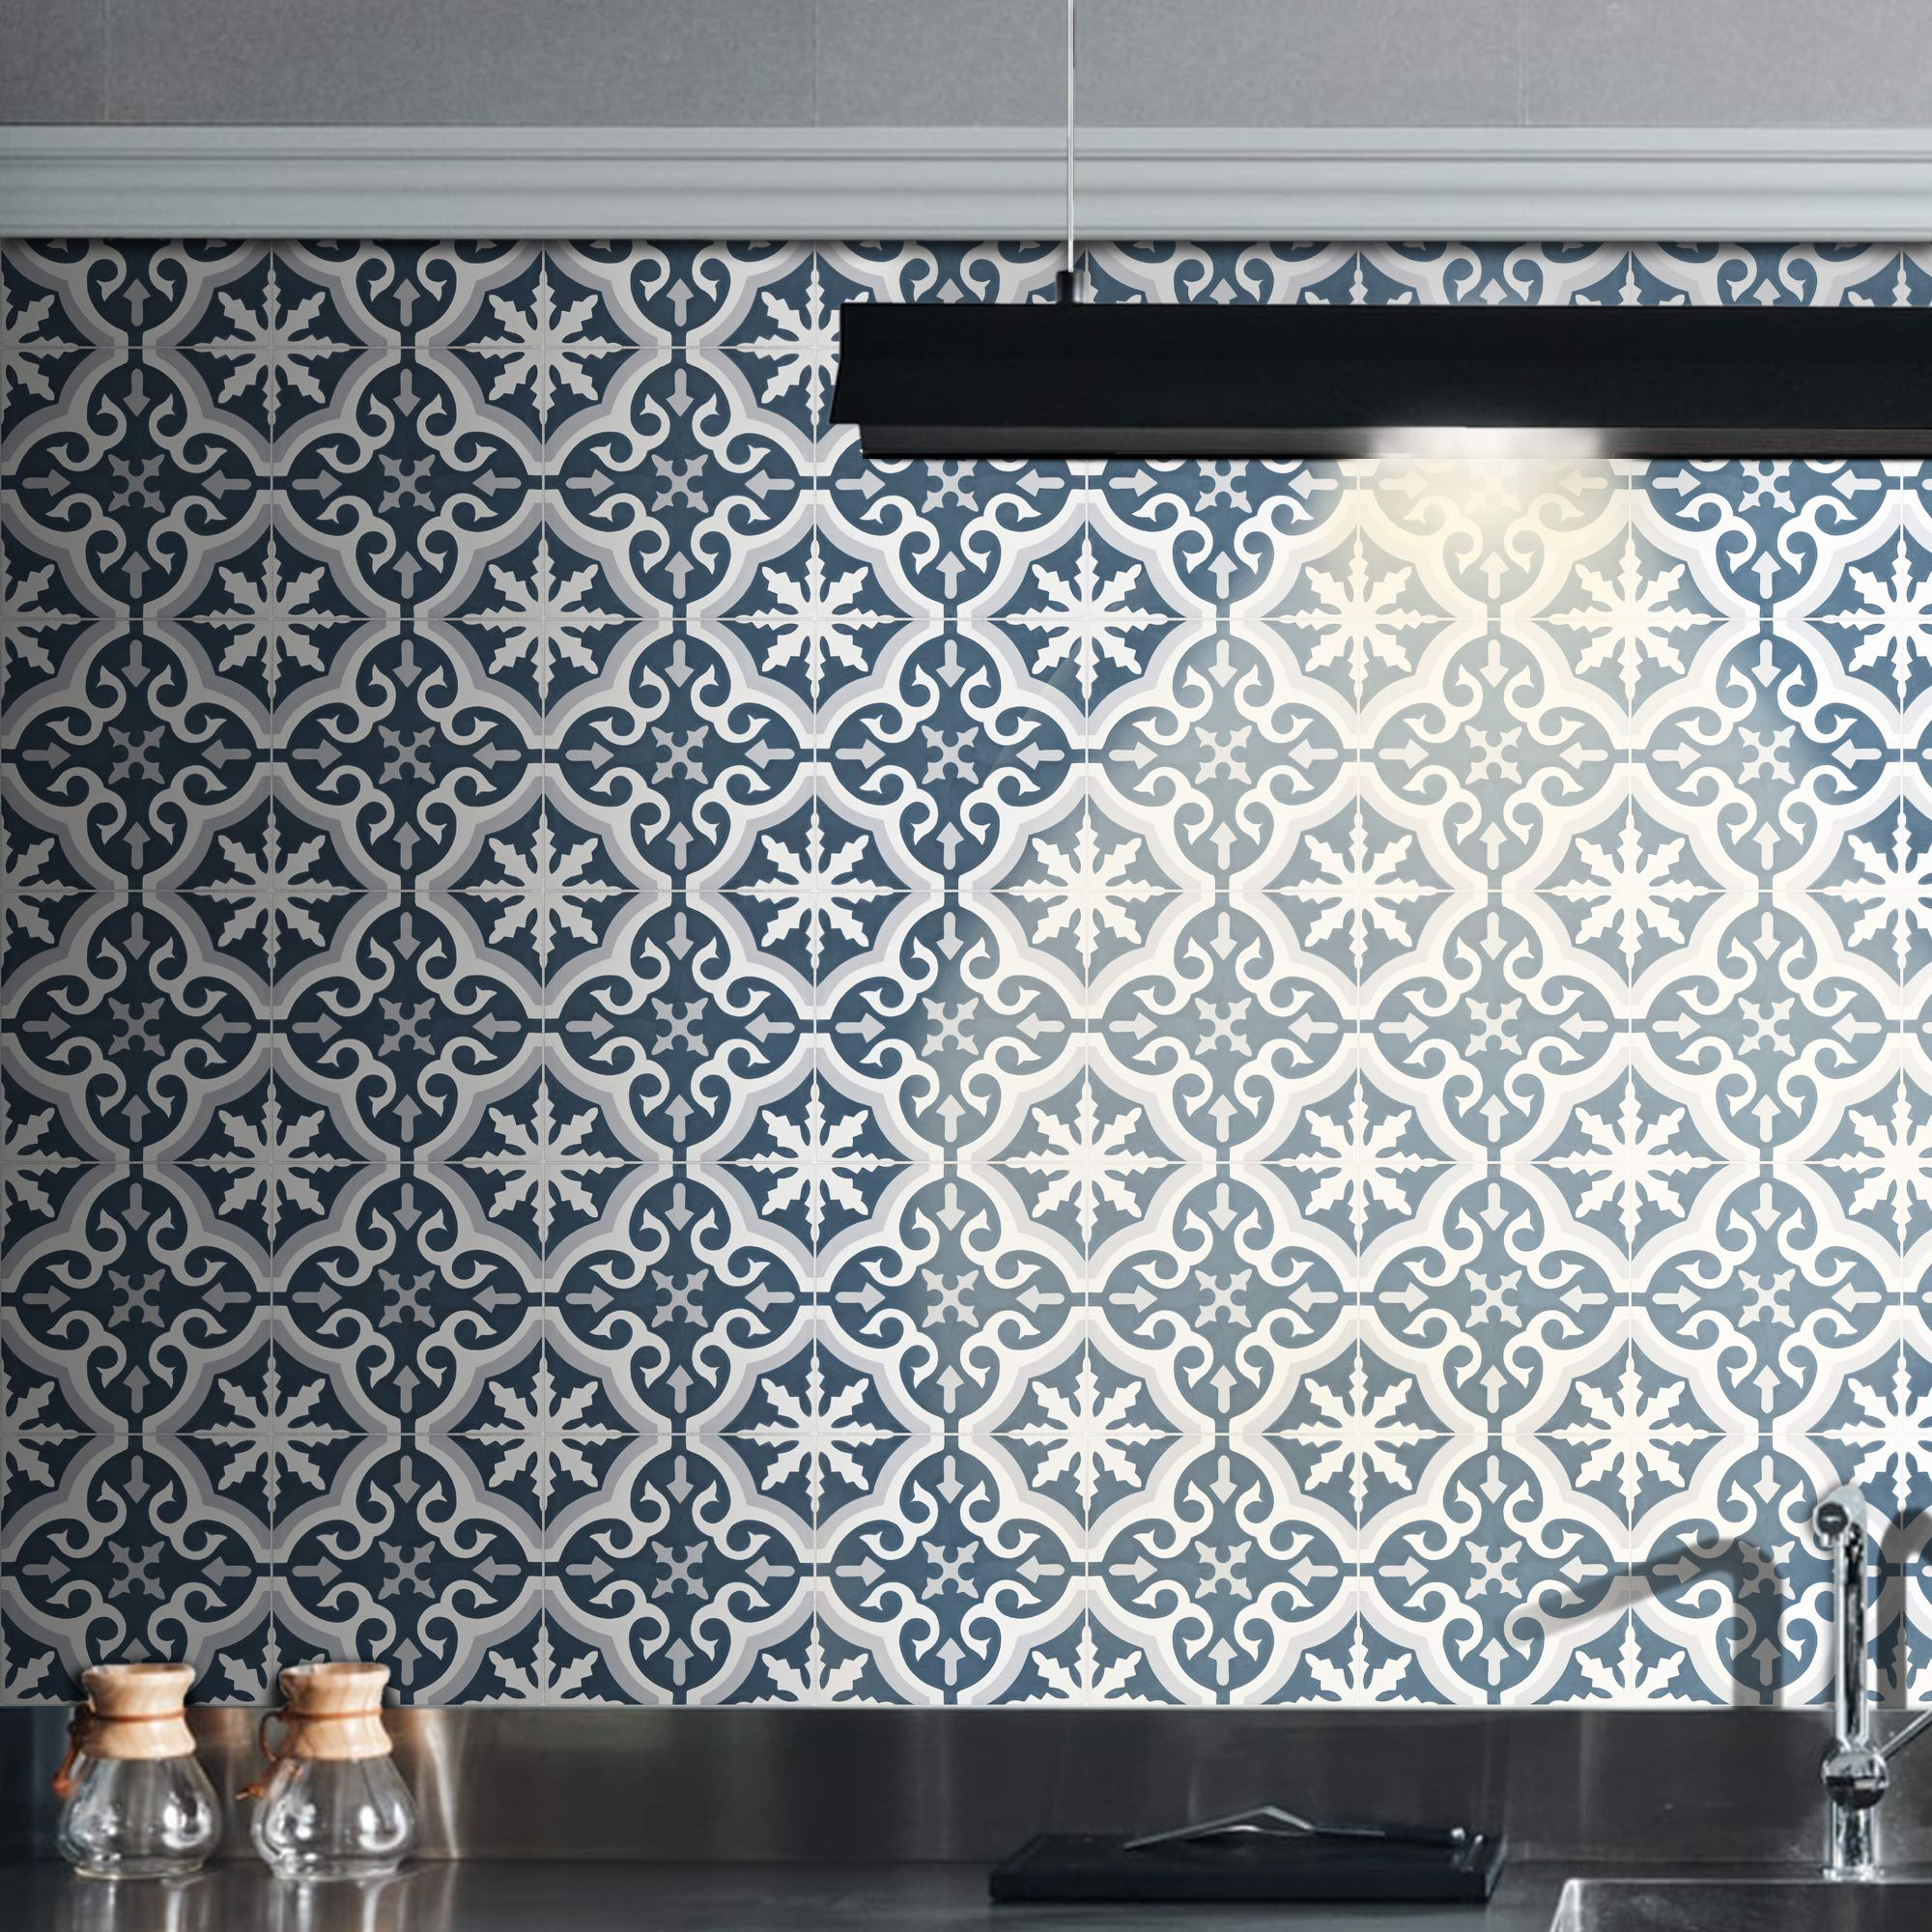 Moroccan Mosaic & Tile House CTP02-12 Argana Handmade Cement Tile, 8'' x 8'', Grey/Bleu/White